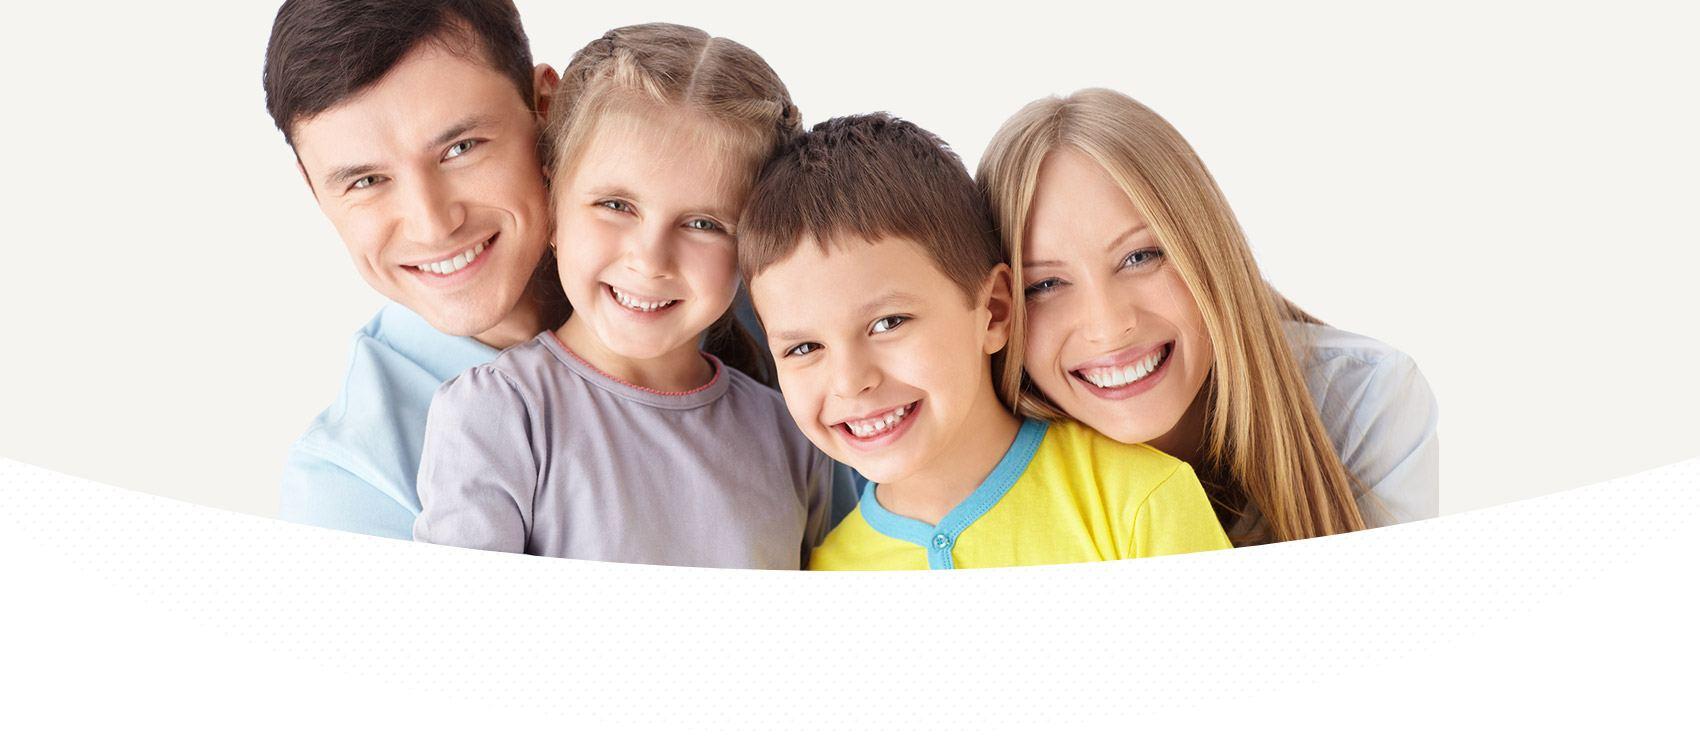 Minimally Invasive Dentistry - North Aurora Smiles